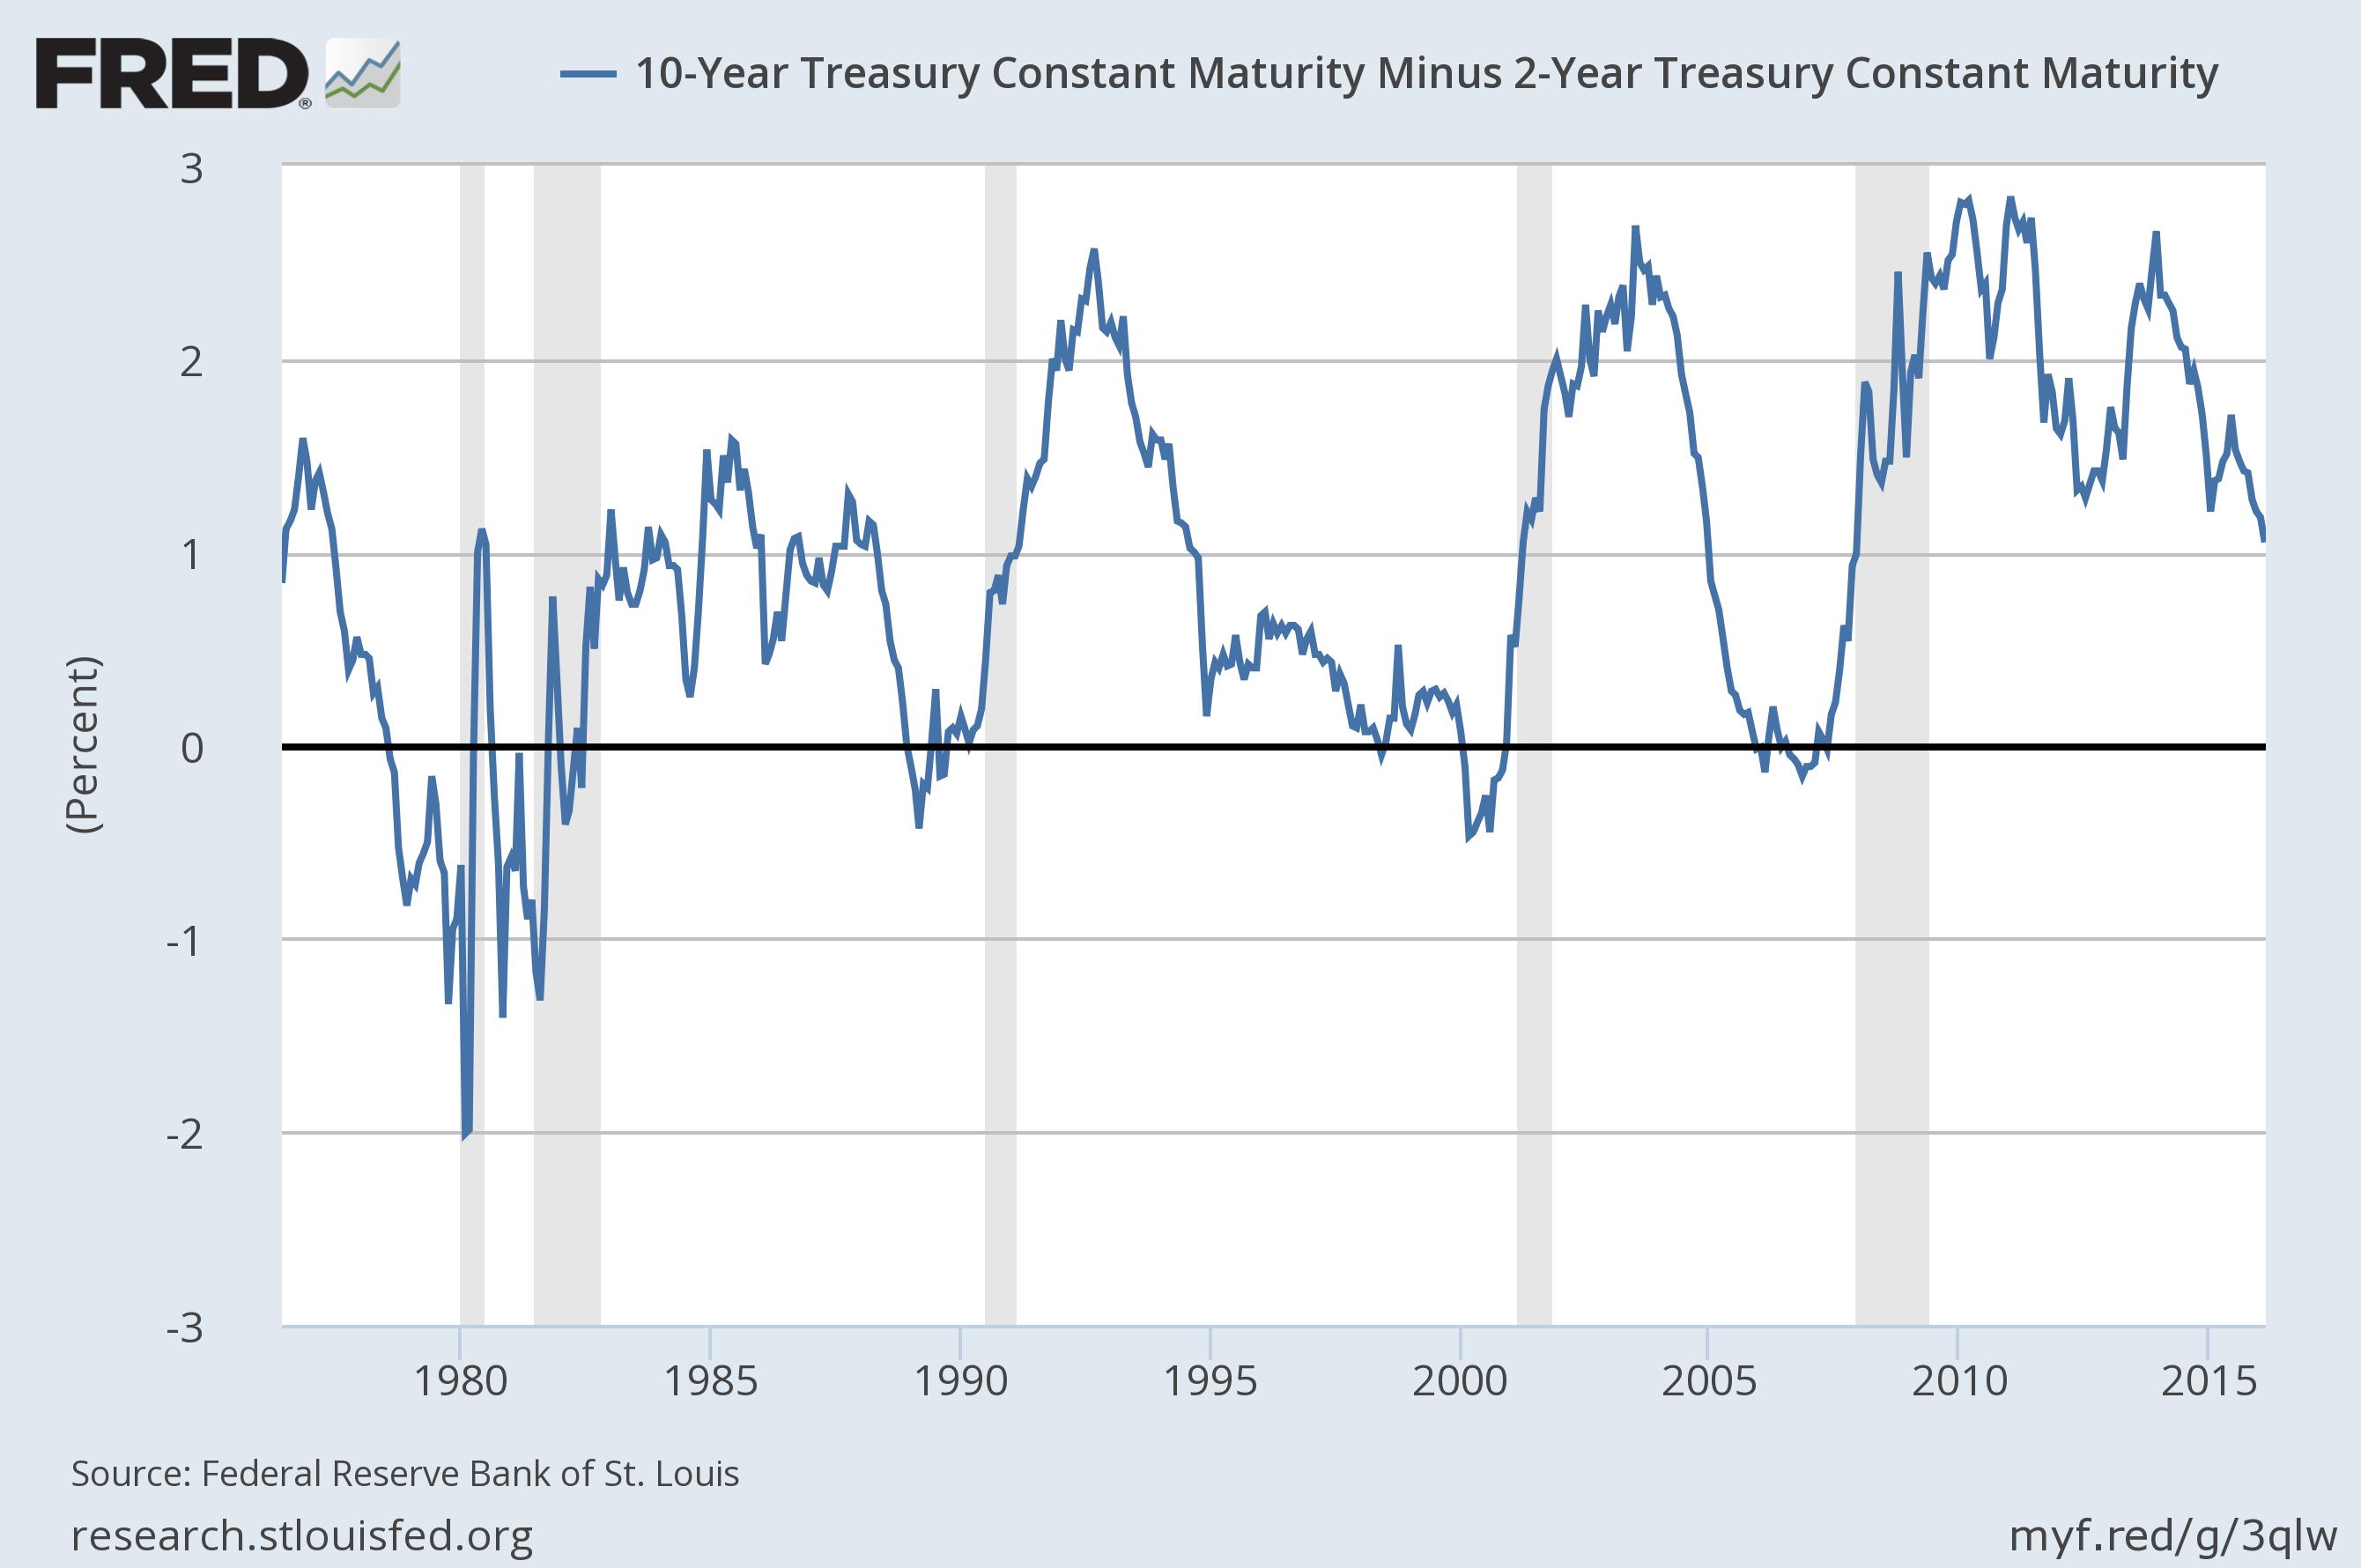 One year constant maturity treasury yield